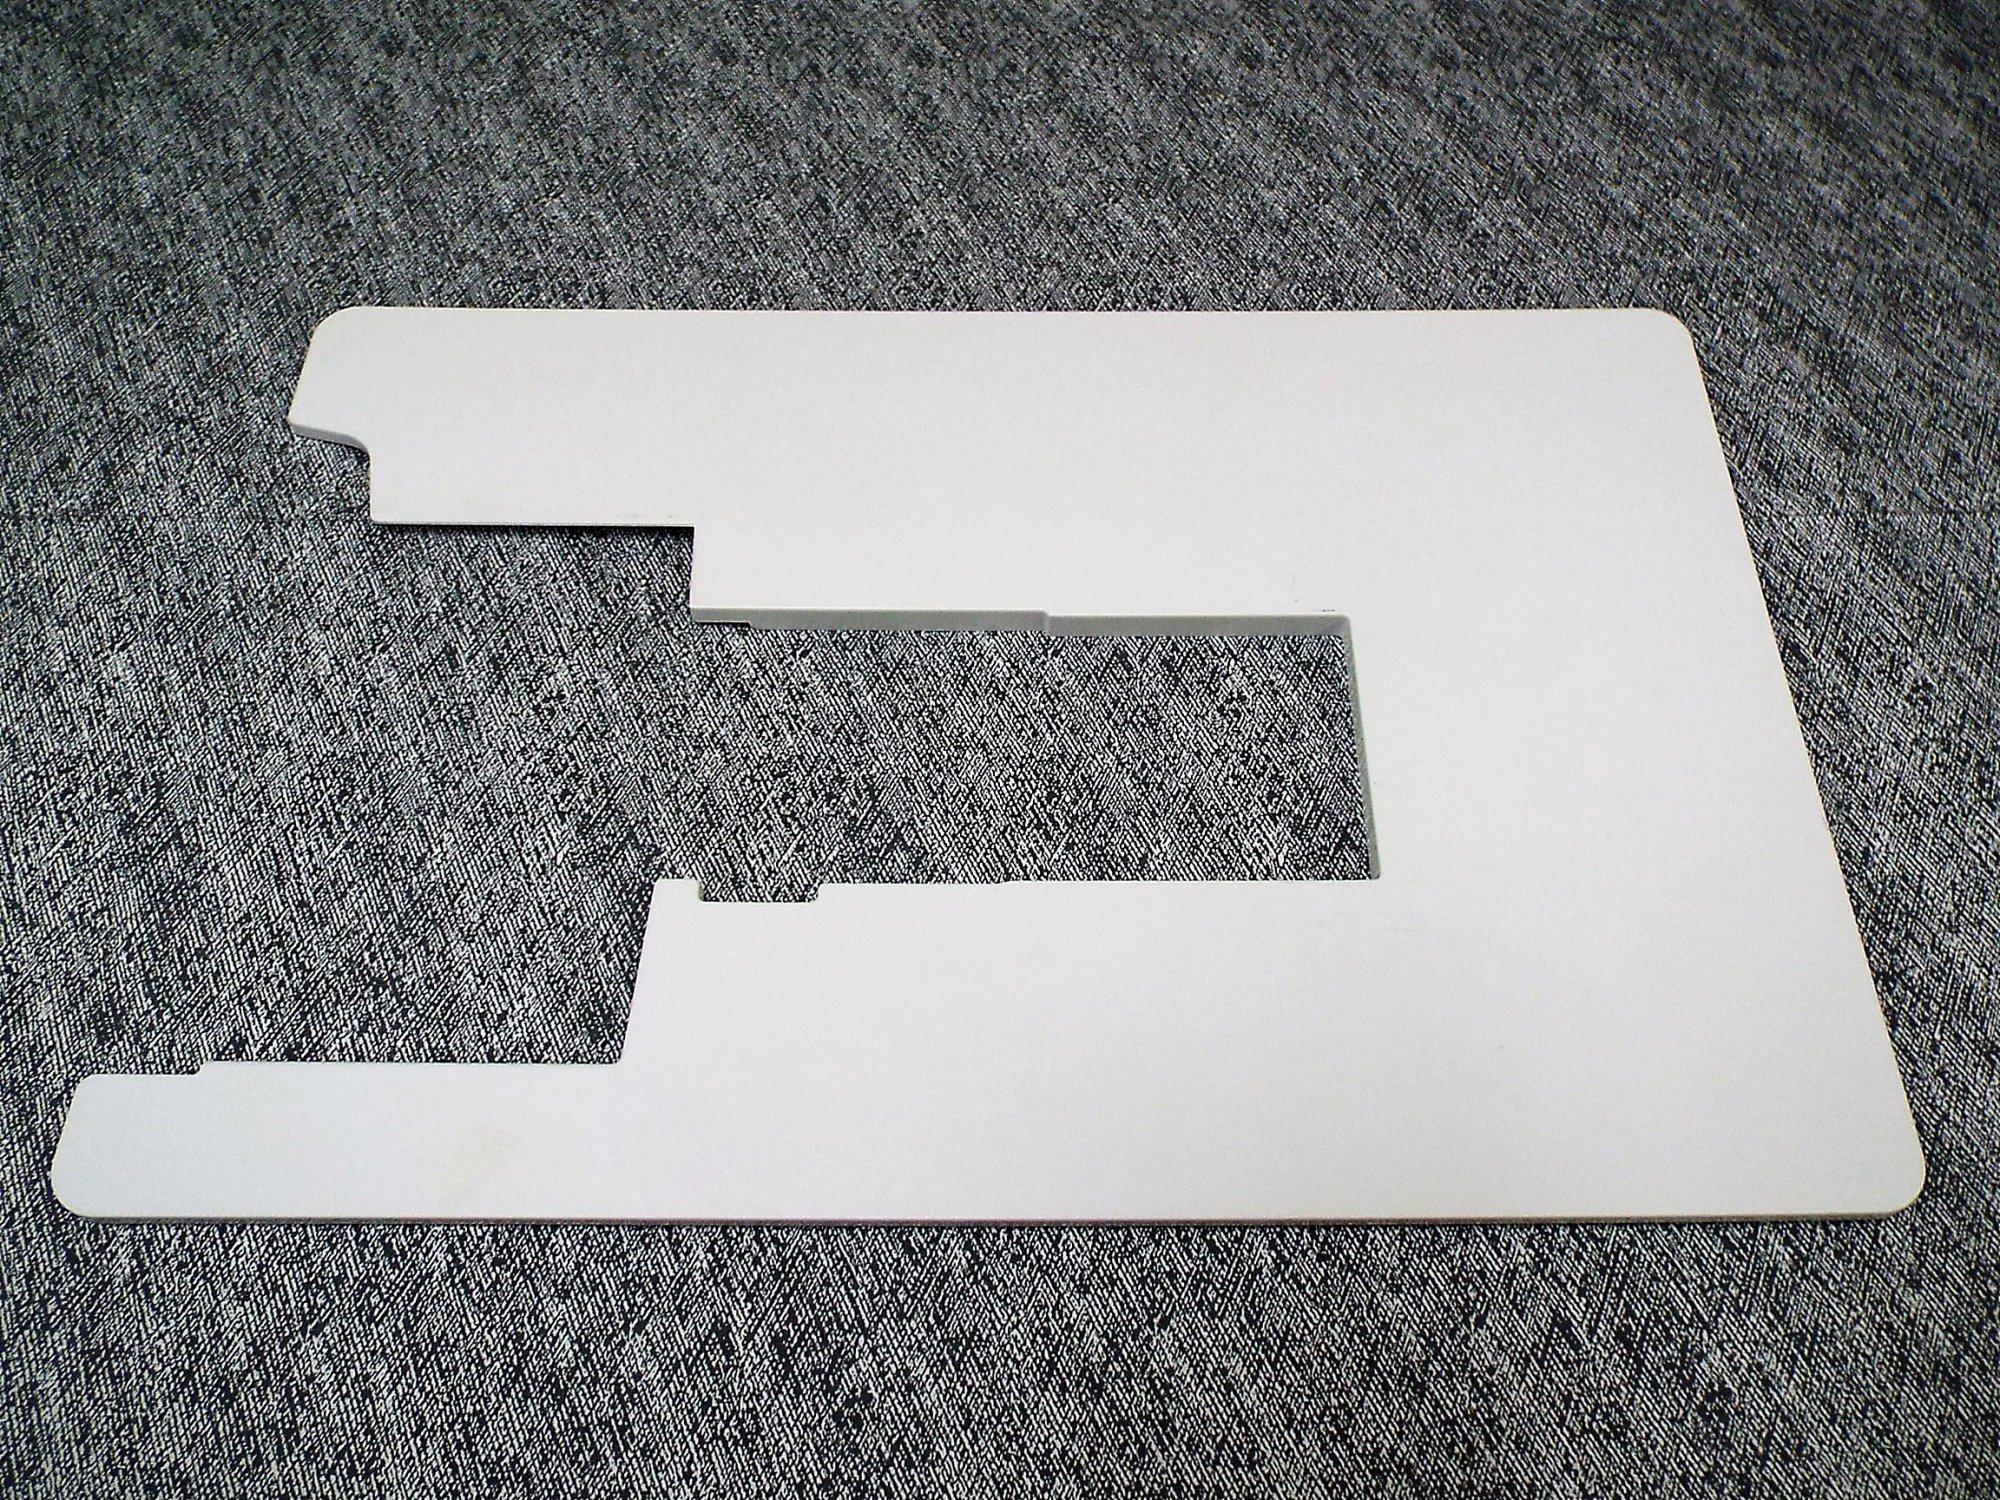 Janome Insert Plate F